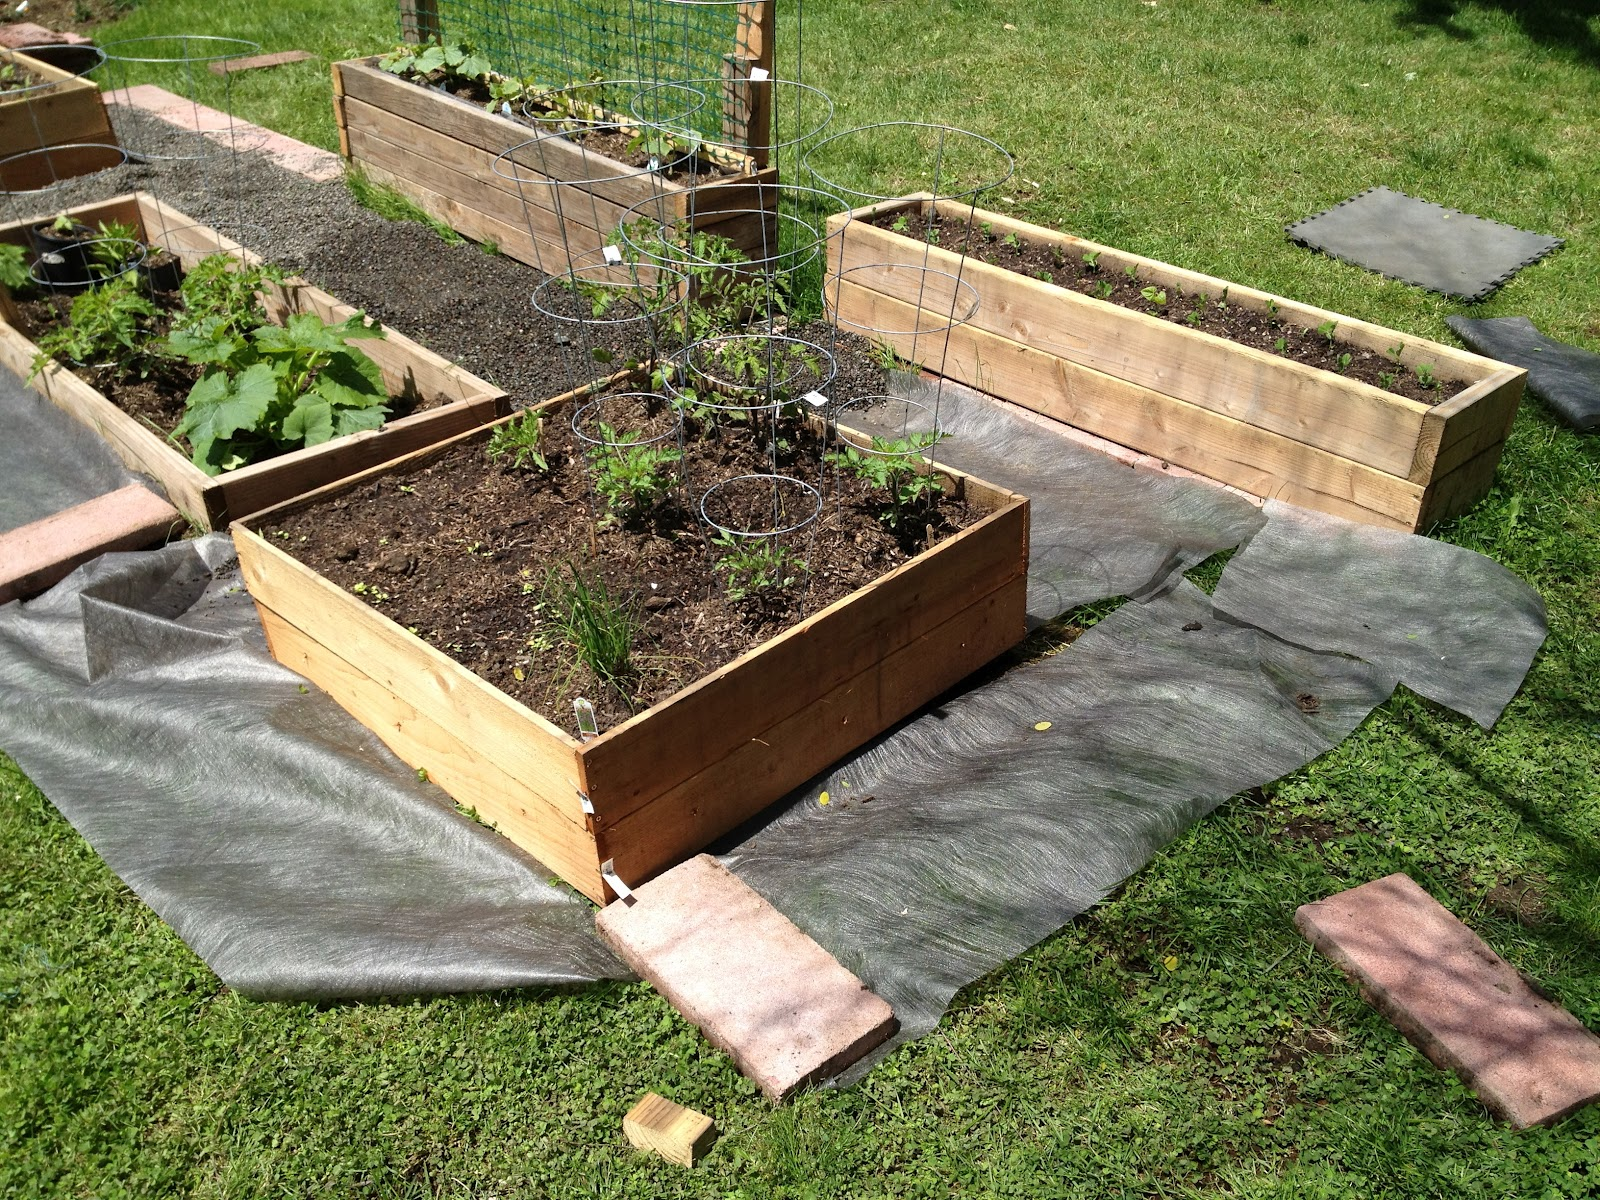 Cubic Yard Measurement Landscaping : Pea gravel cost per cubic yard home improvement